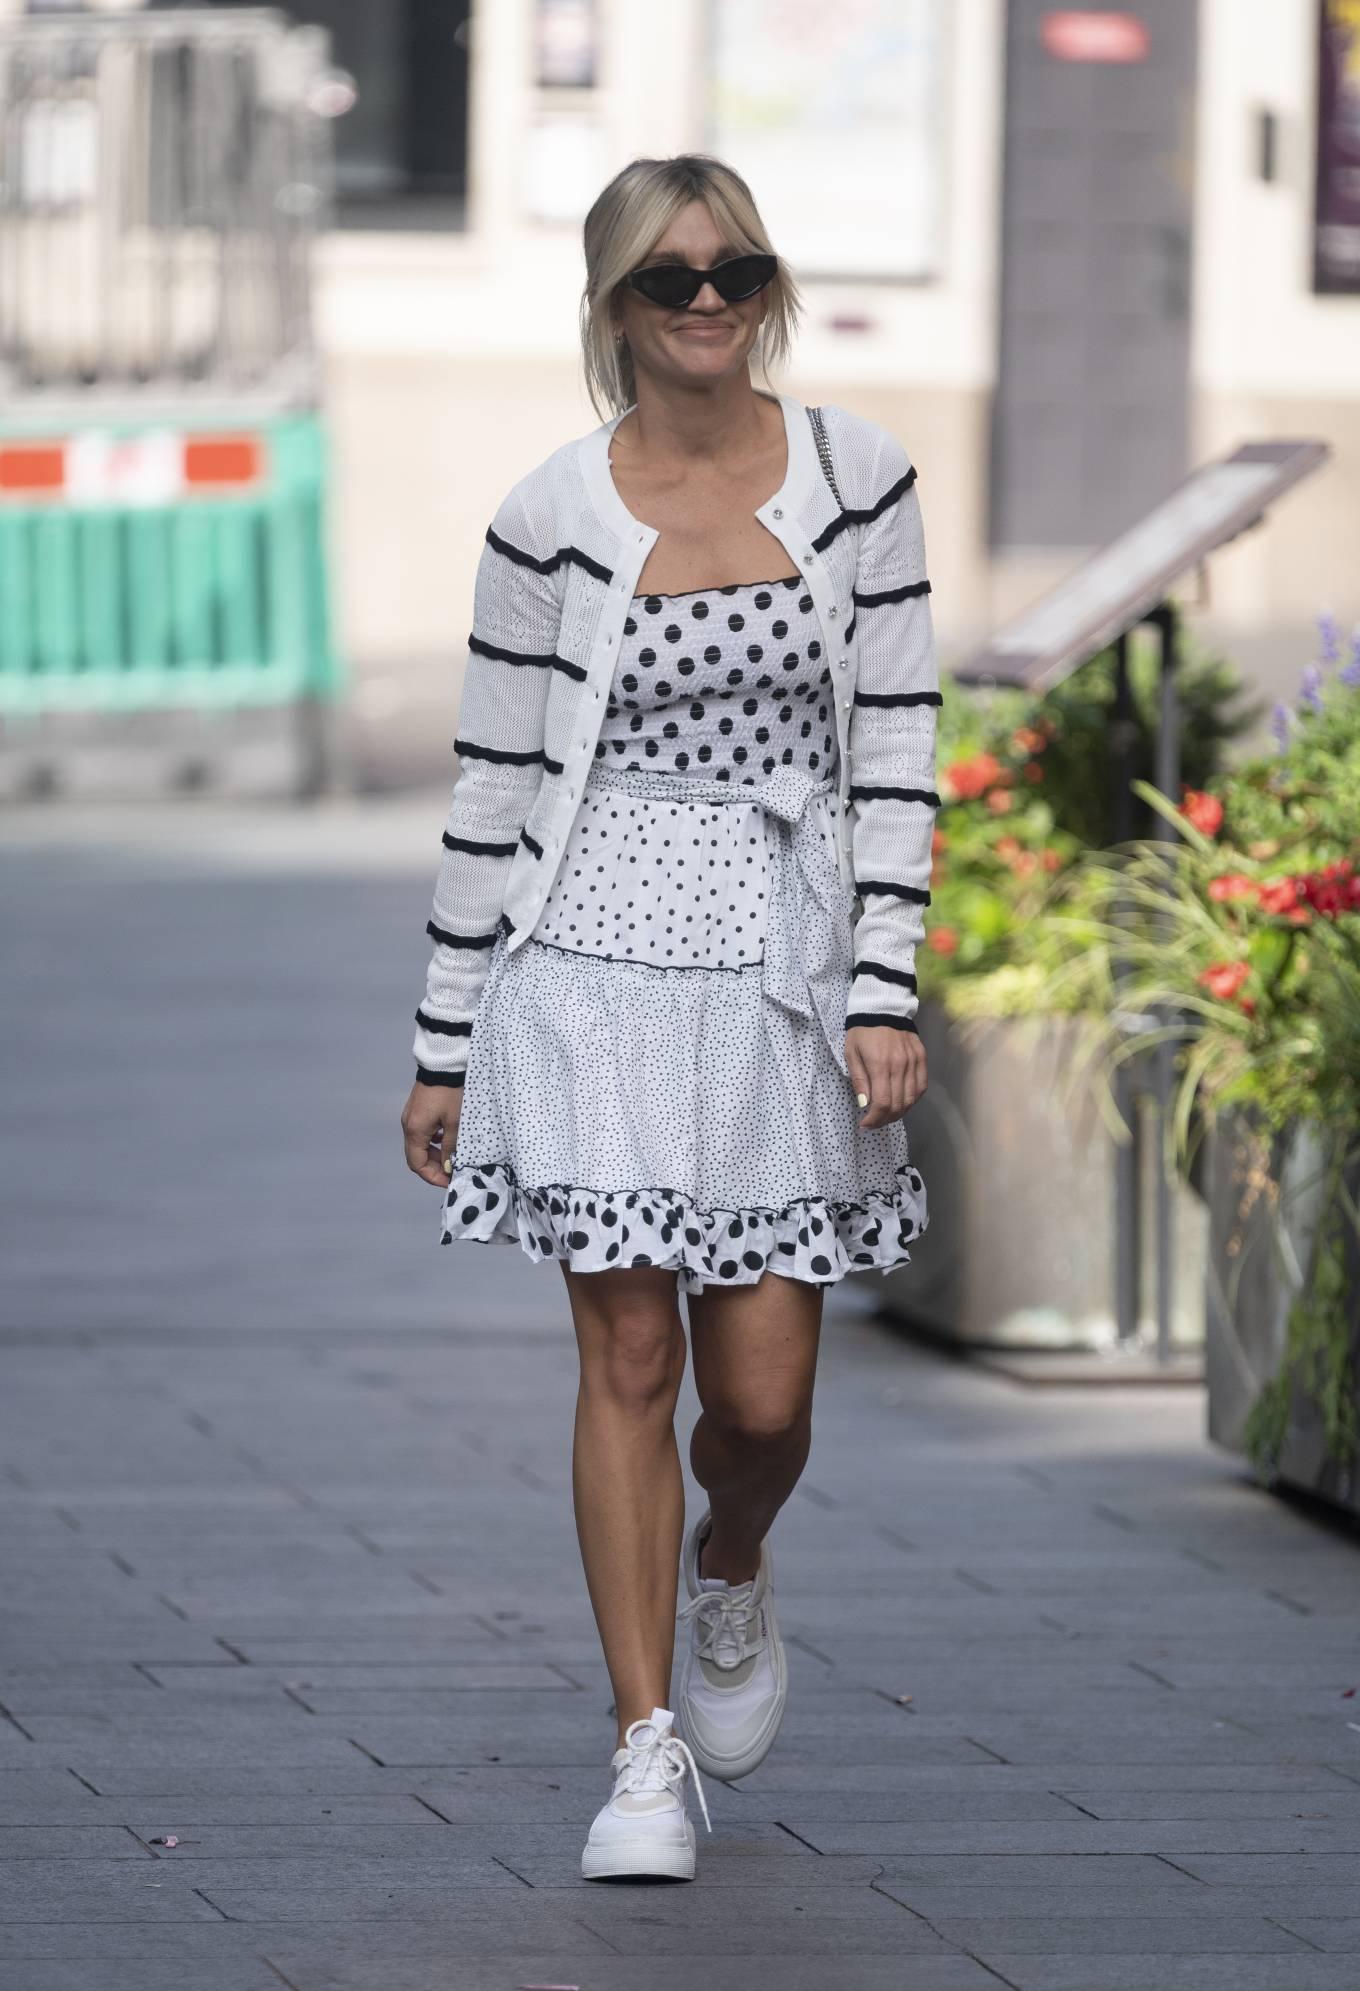 Ashley Roberts 2020 : Ashley Roberts – Wears White Polka Dot dress in London-06